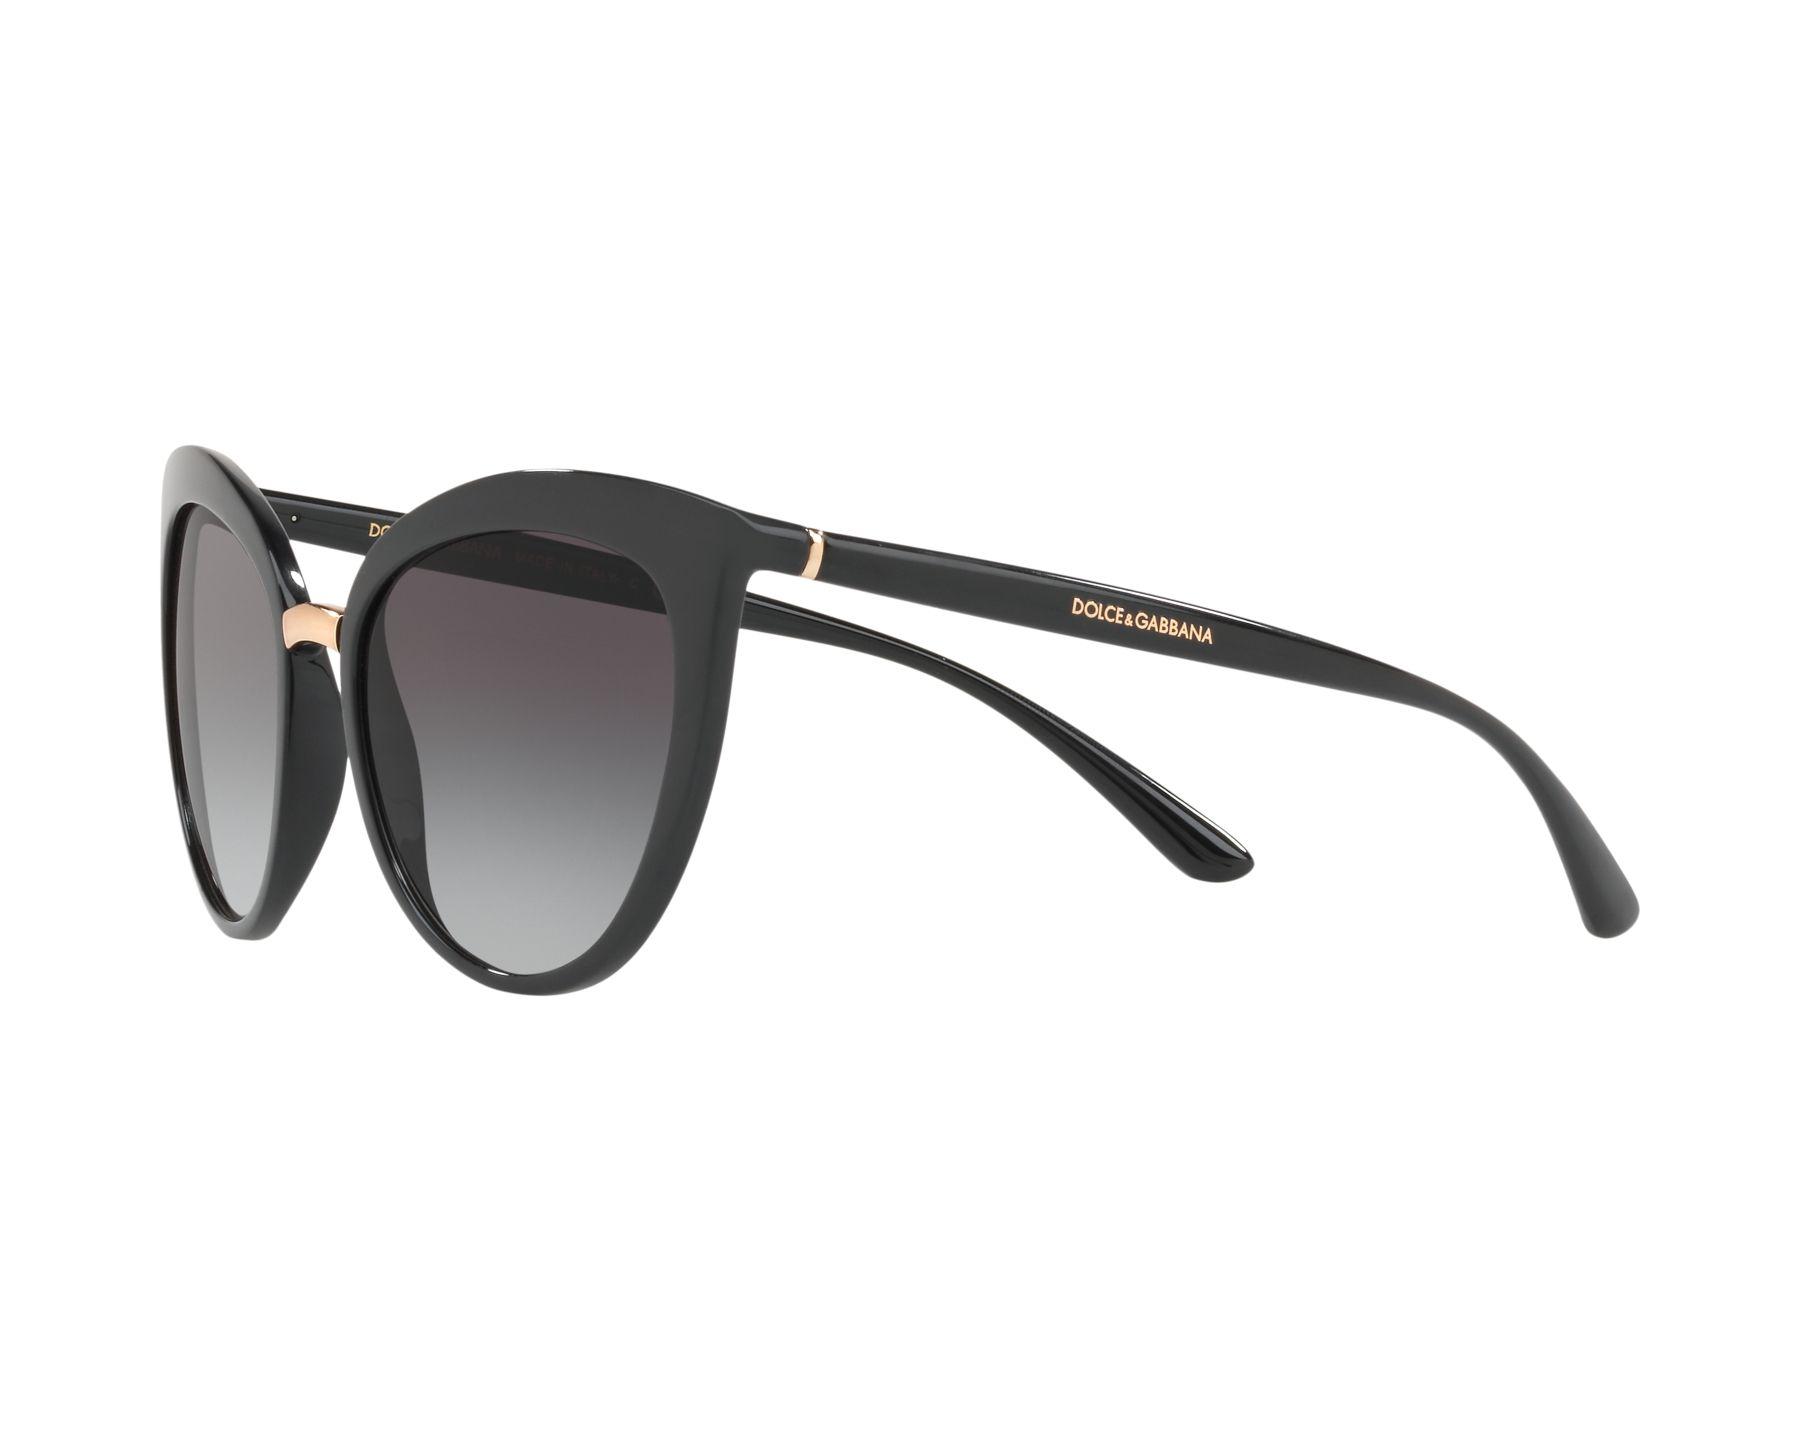 1ae04bee5a0d Sunglasses Dolce & Gabbana DG-6113 501/8G 55-18 Black Gold 360